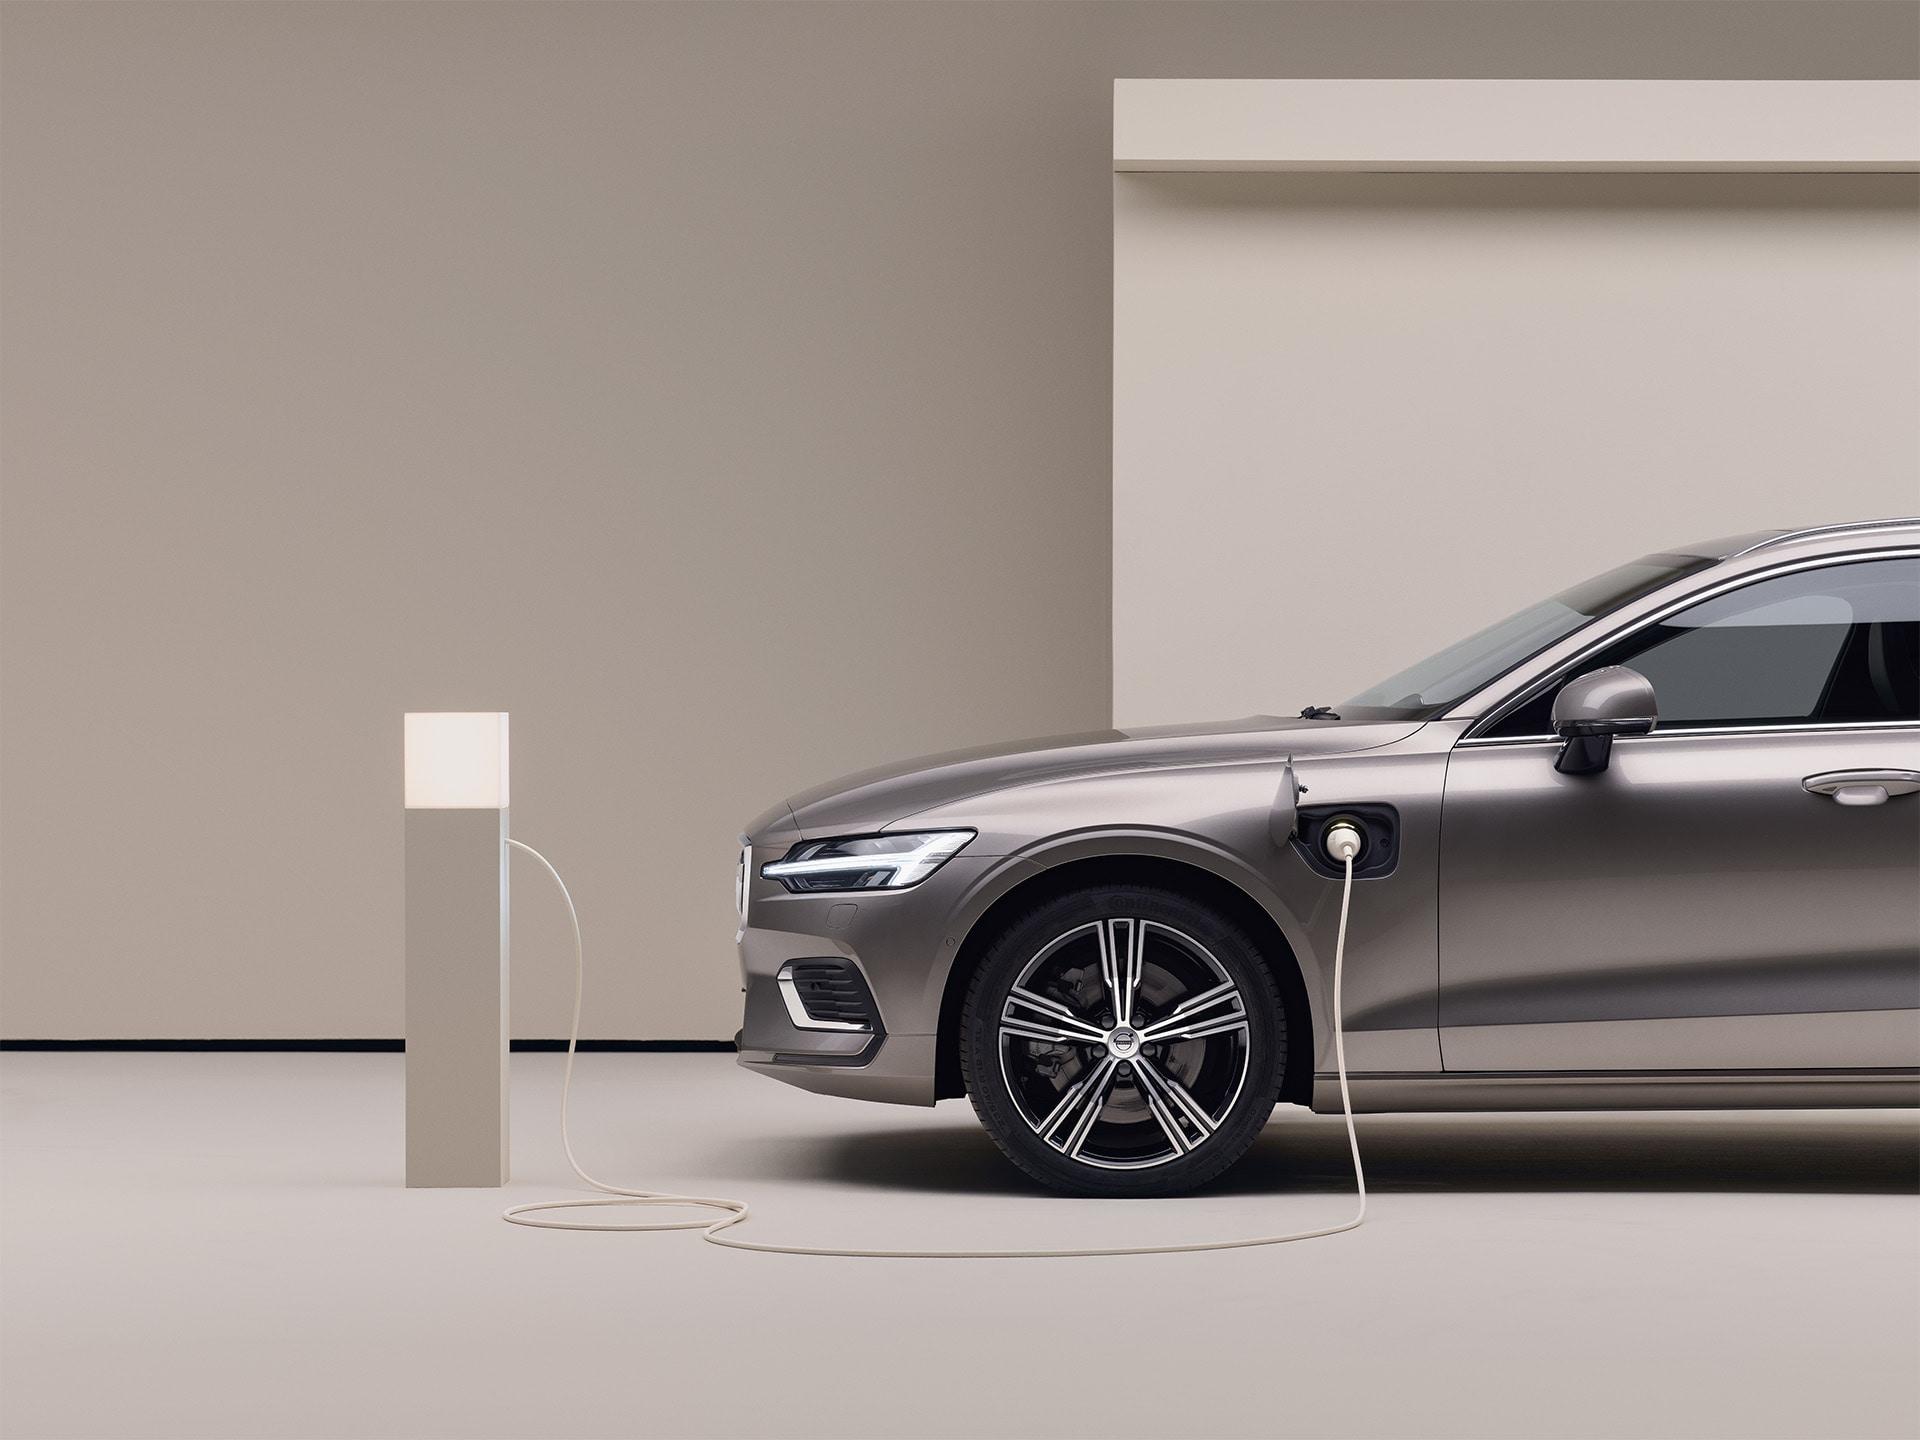 Un Volvo estate gris estacionado se conecta a un punto de carga